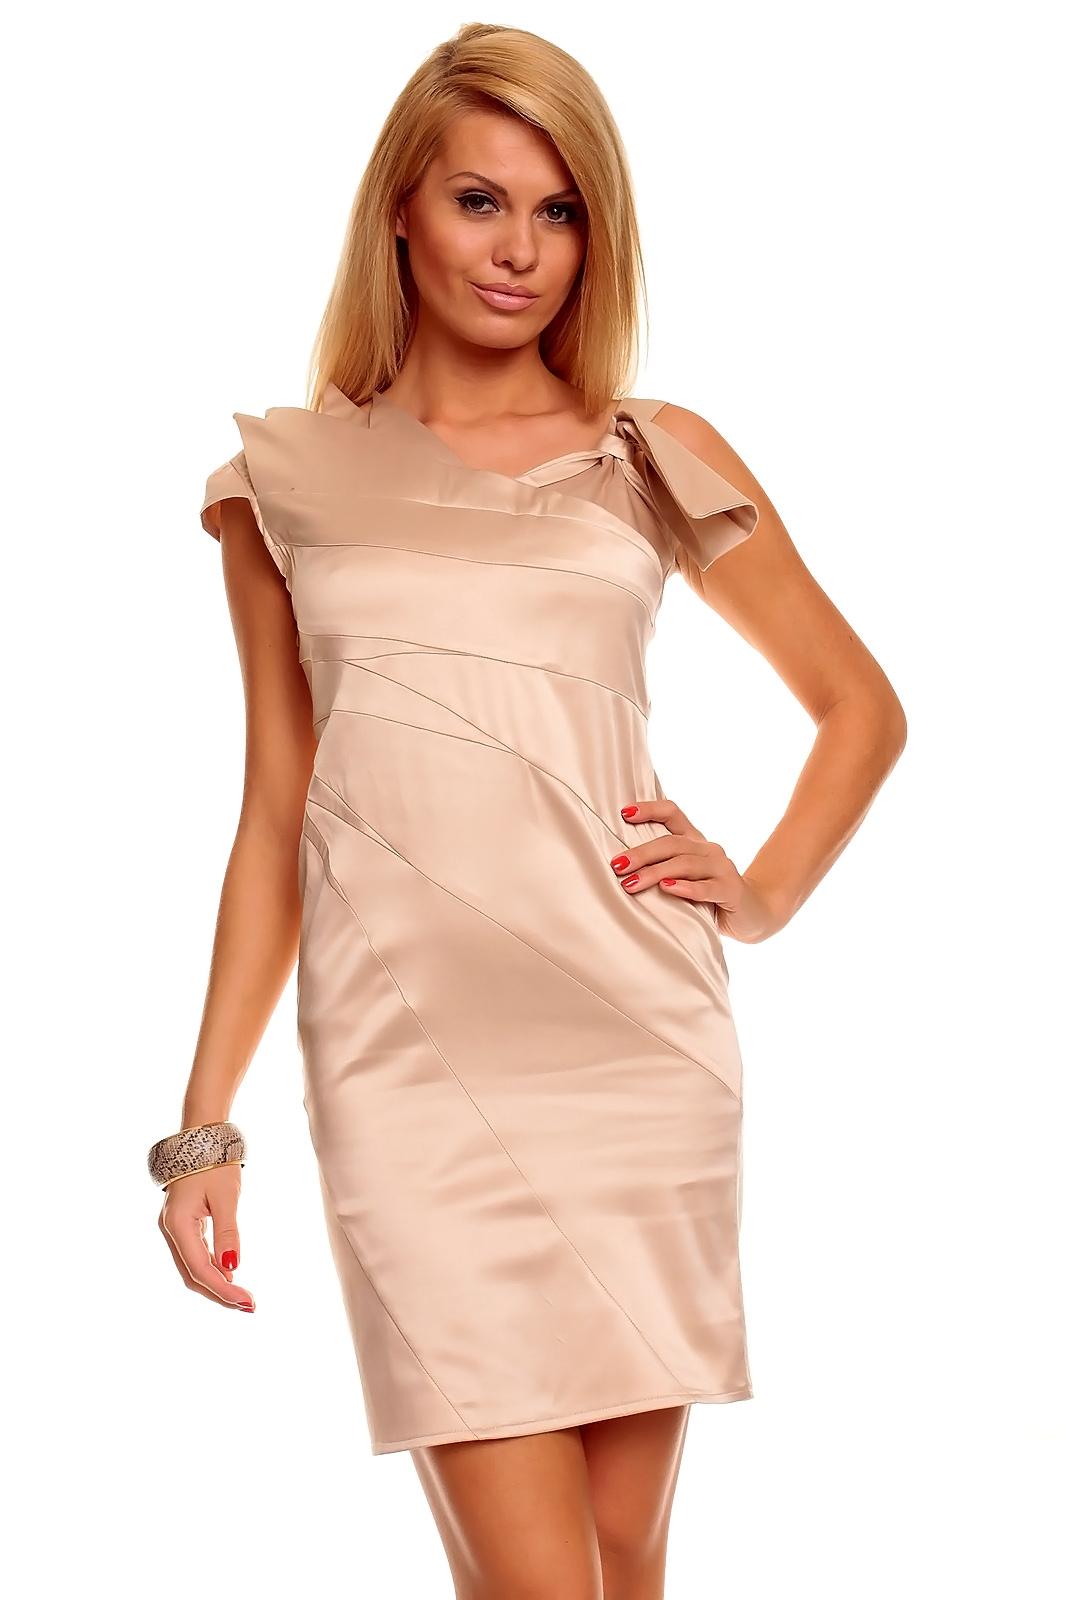 bc0f8ed98e1 Dámské elegantní šaty Mayaadi - béžové